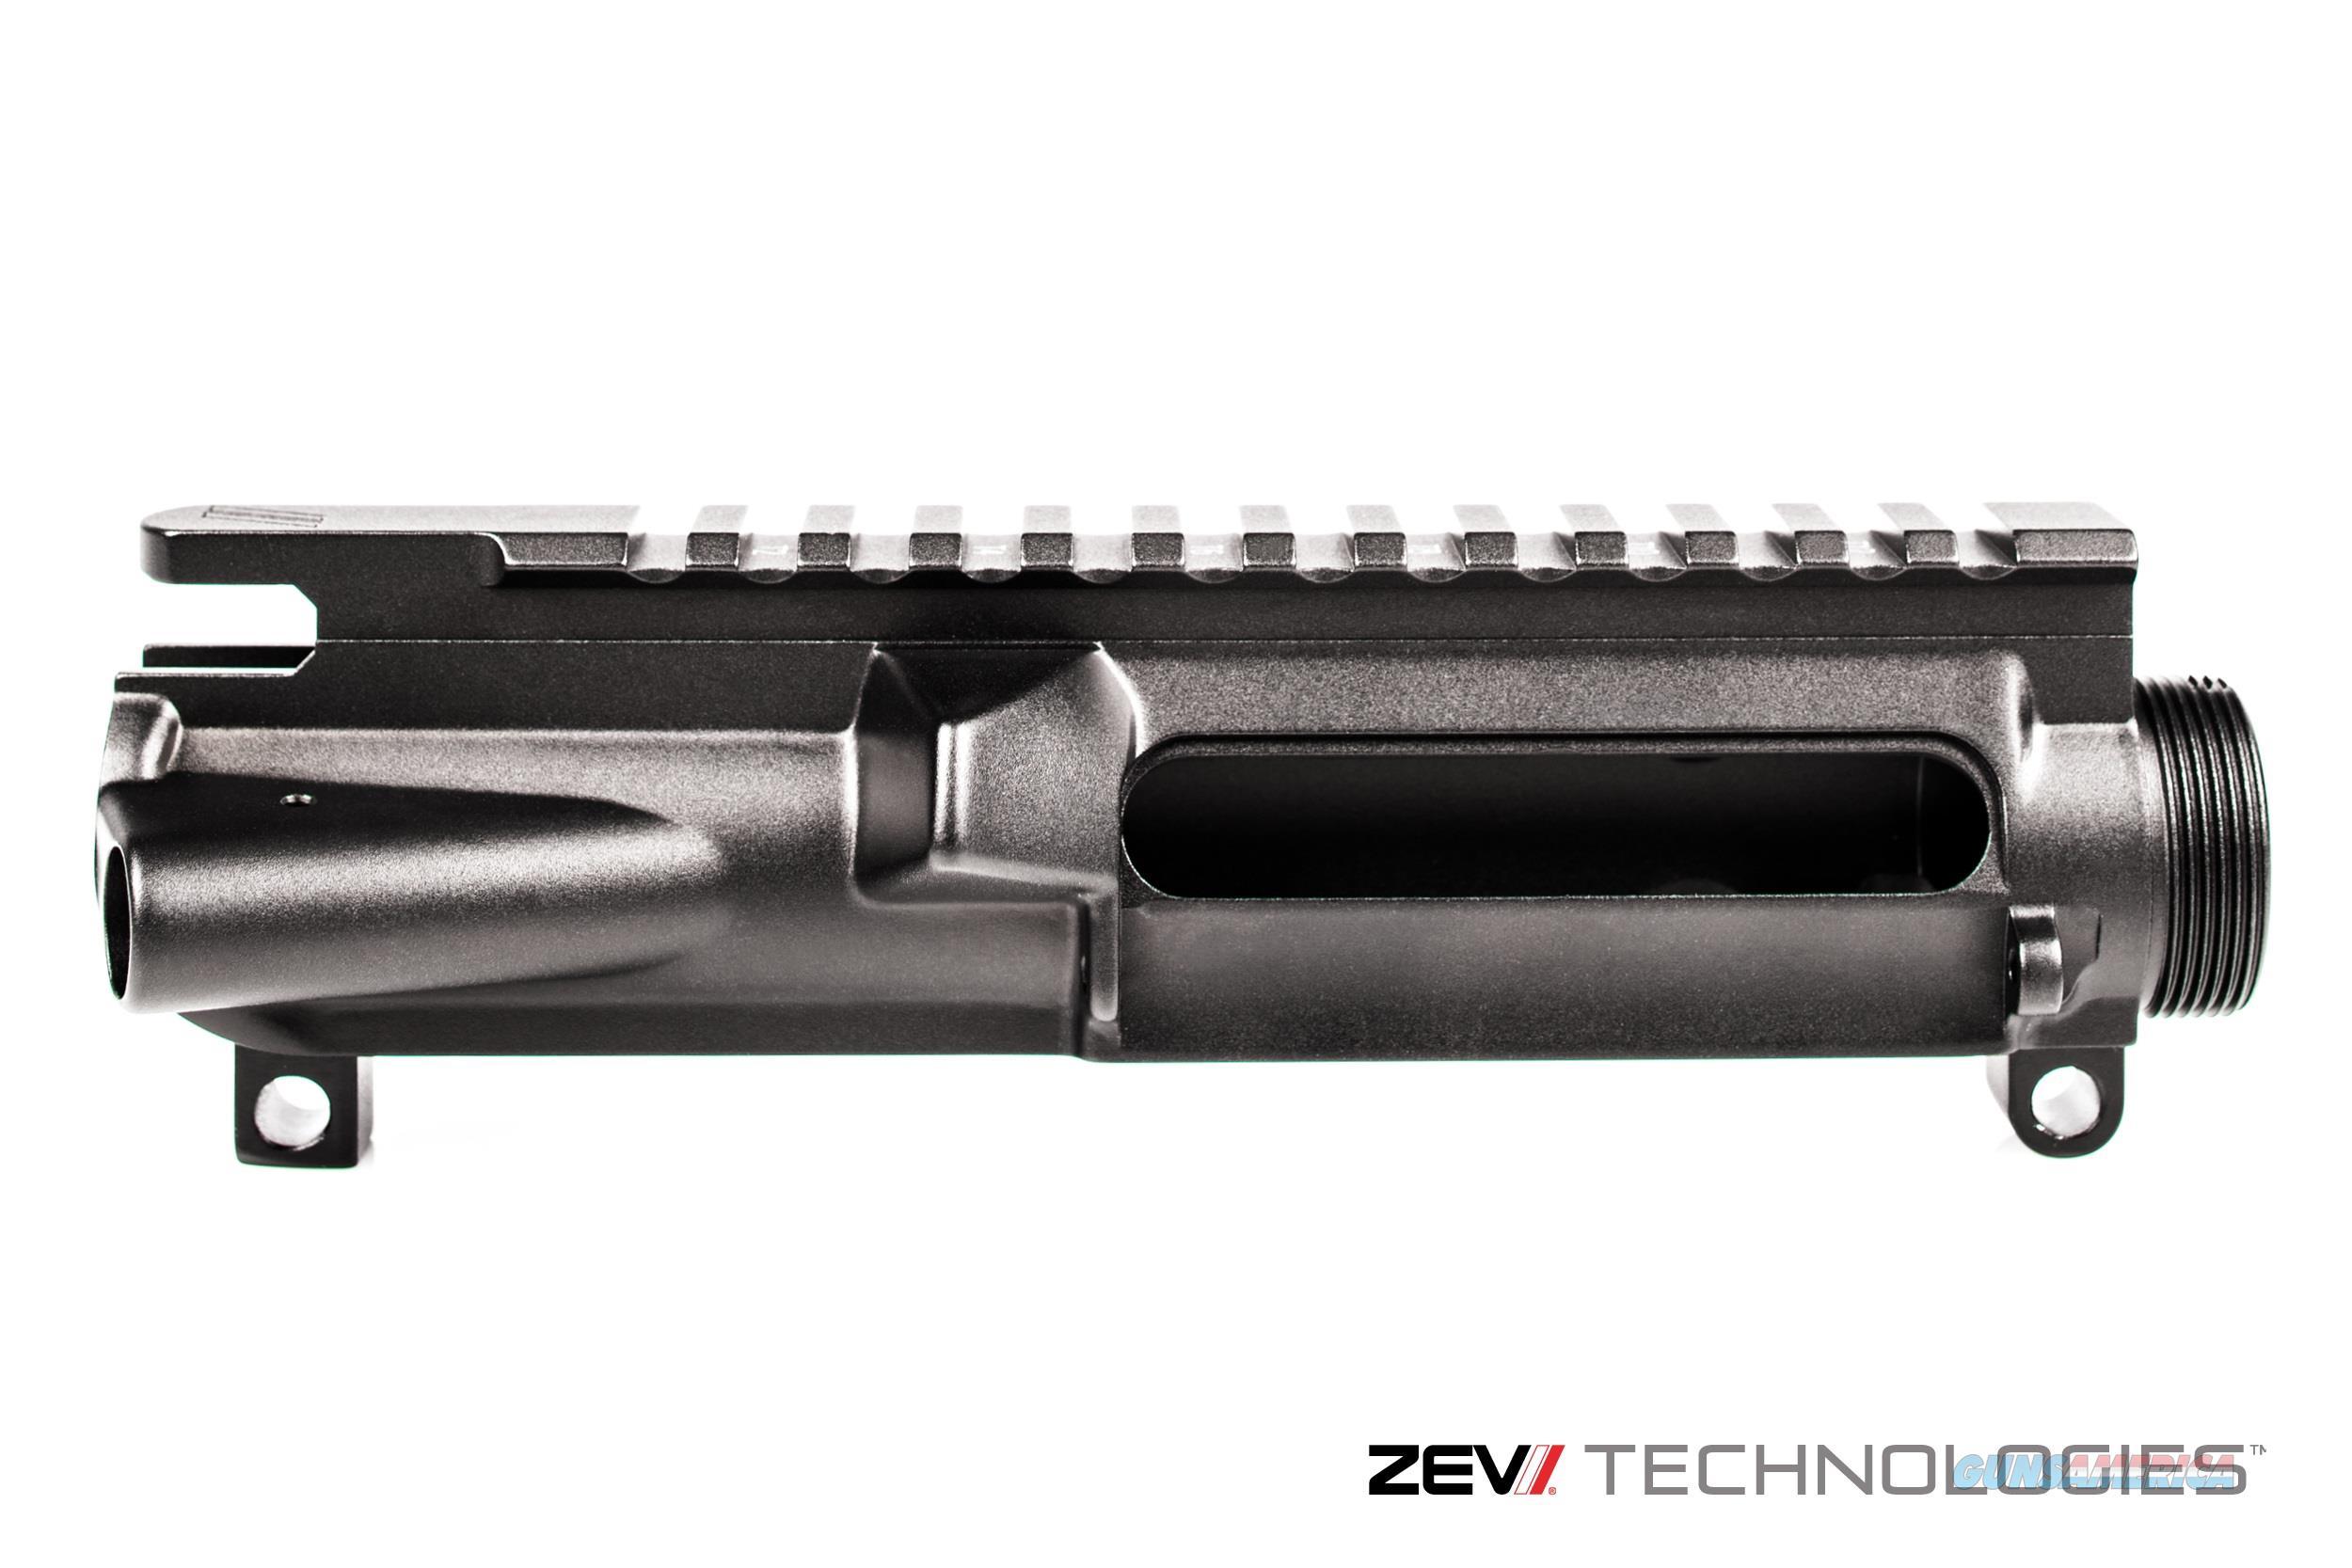 ZEV Technologies AR15 Forged Upper Receiver  Non-Guns > Gun Parts > M16-AR15 > Upper Only